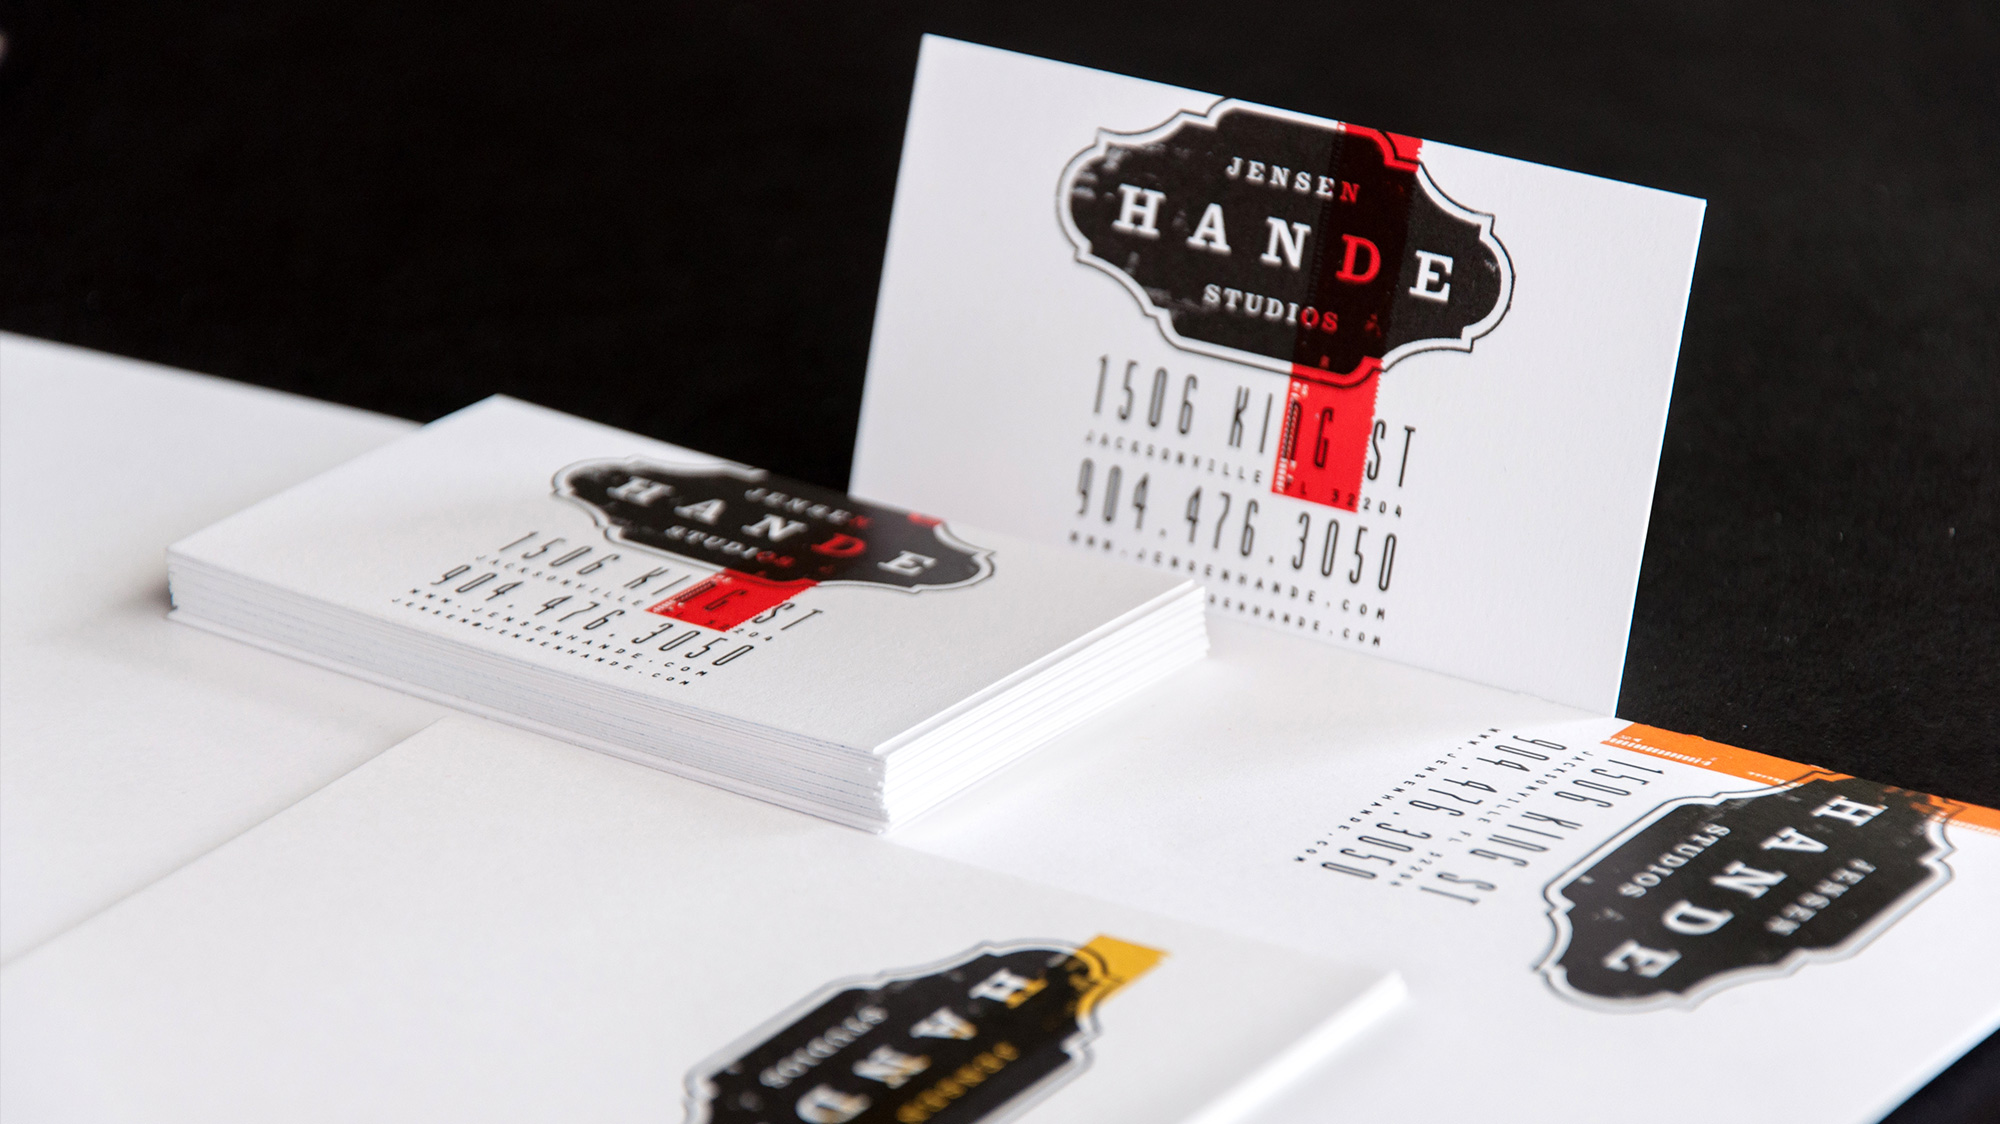 Jensen Hande Studios stationery